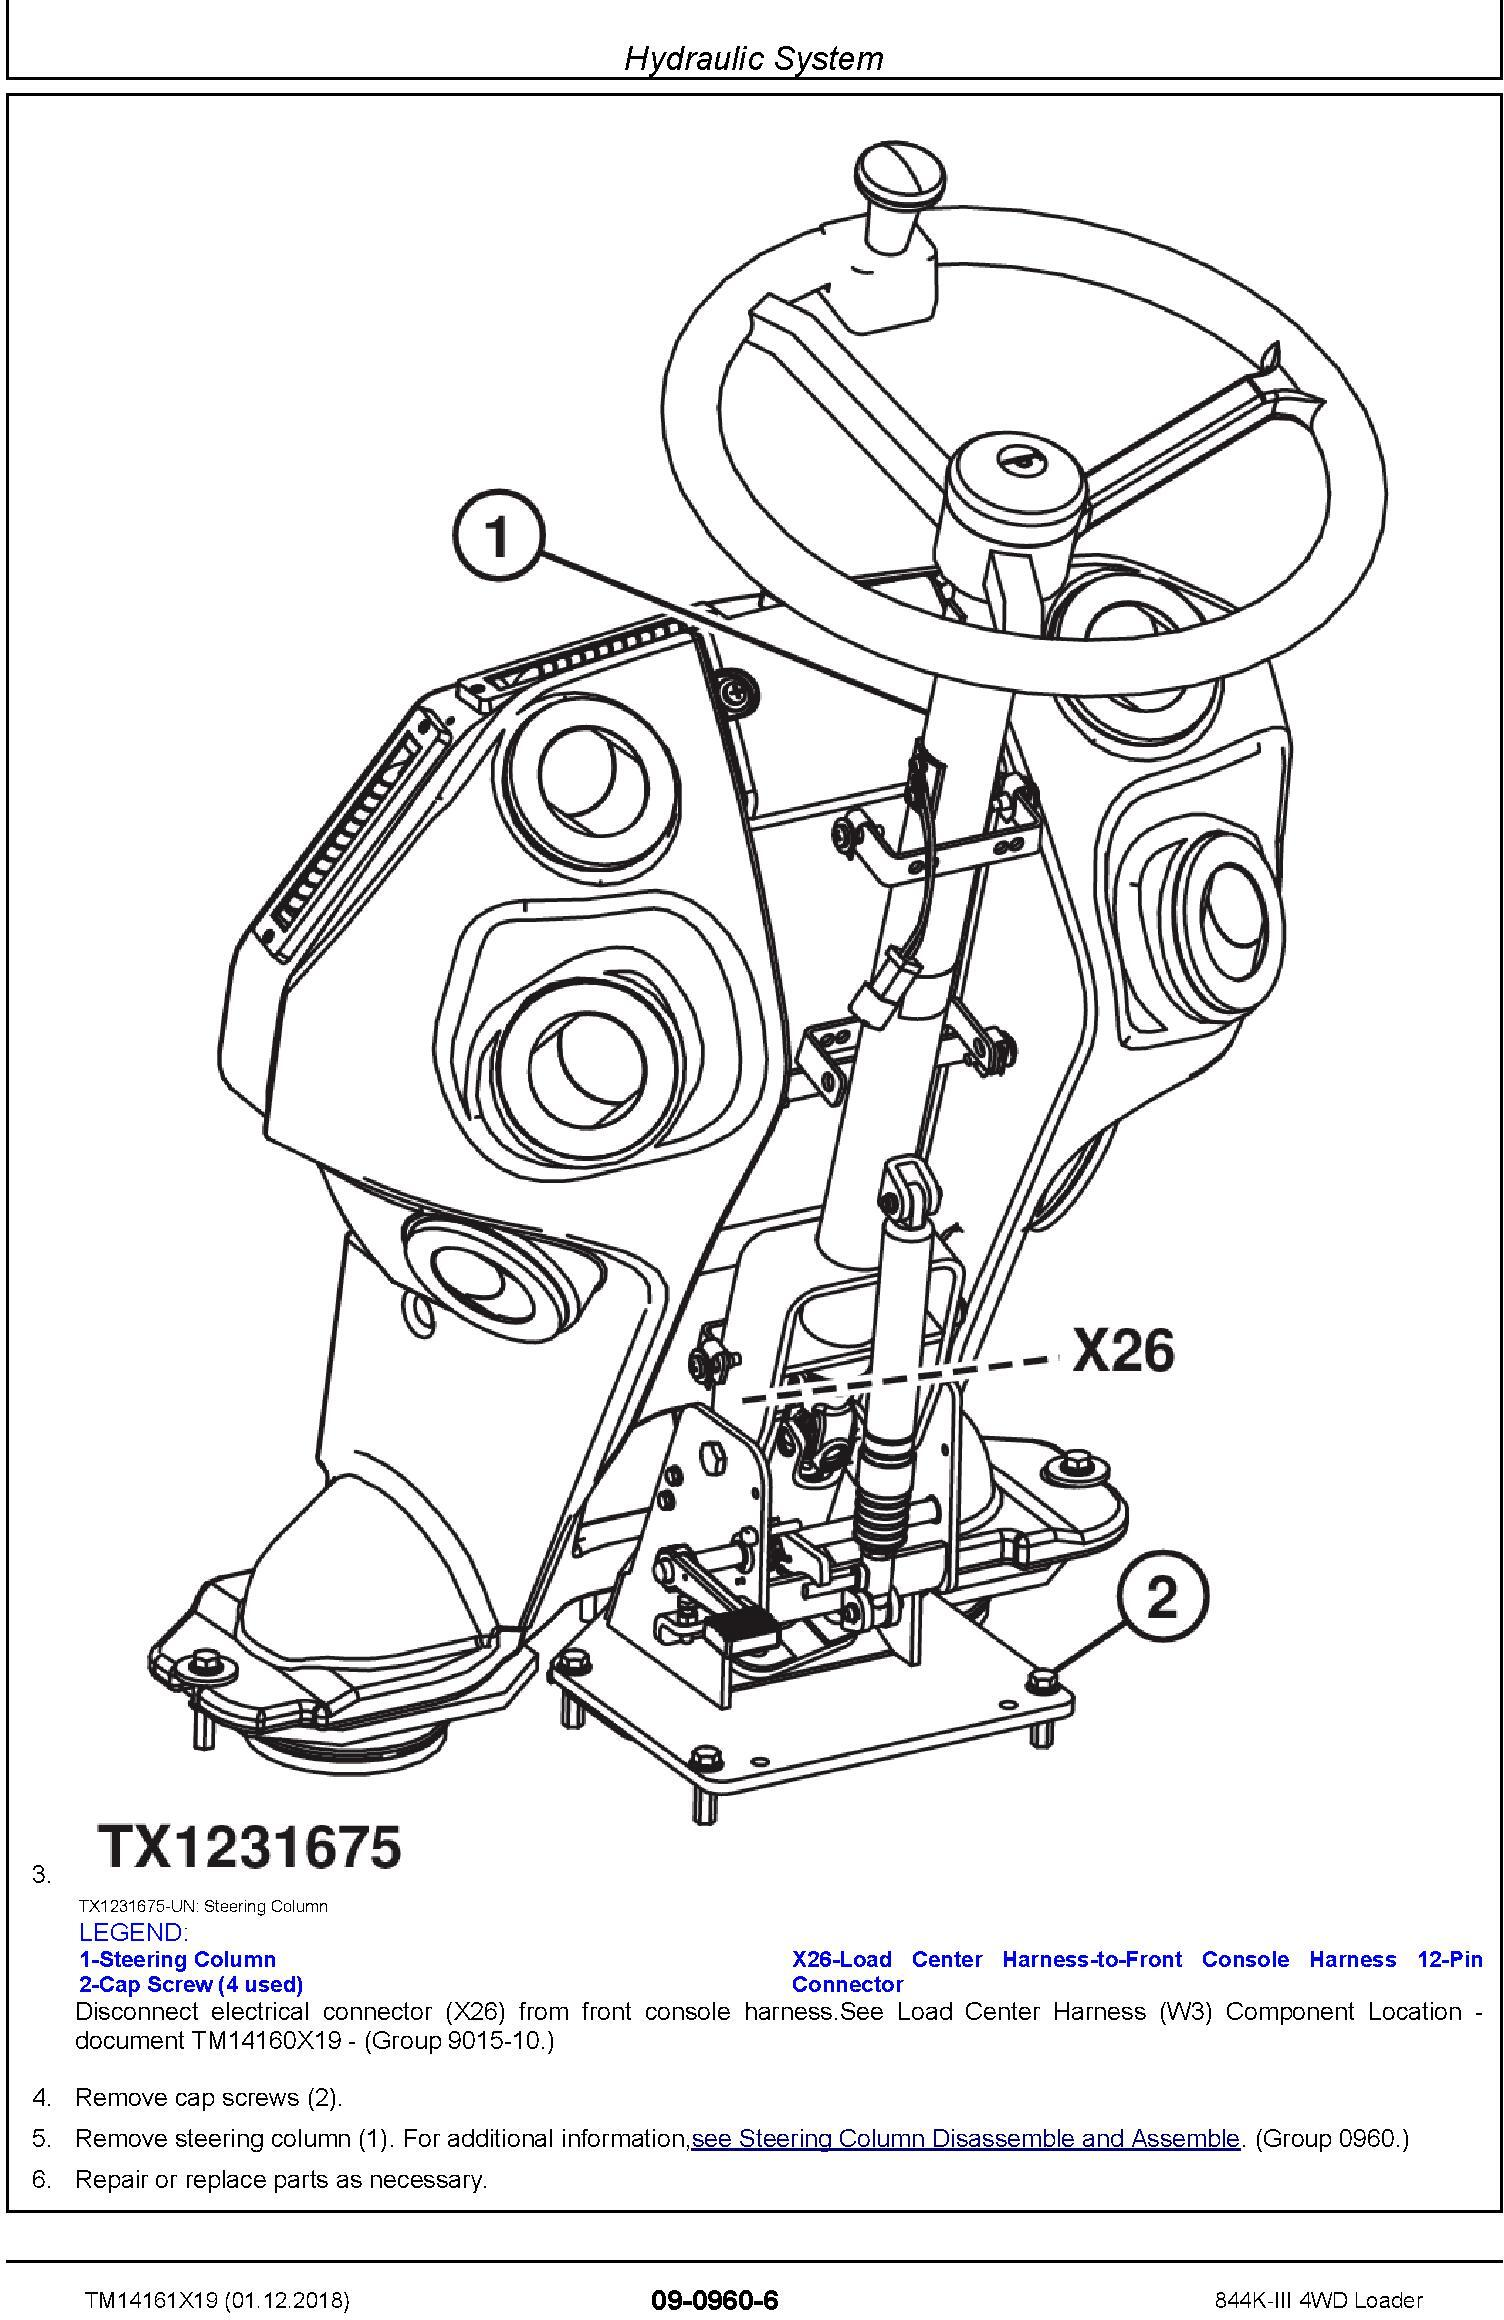 John Deere 844K-III (SN. D677782-) 4WD Loader Repair Technical Service Manual (TM14161X19) - 3